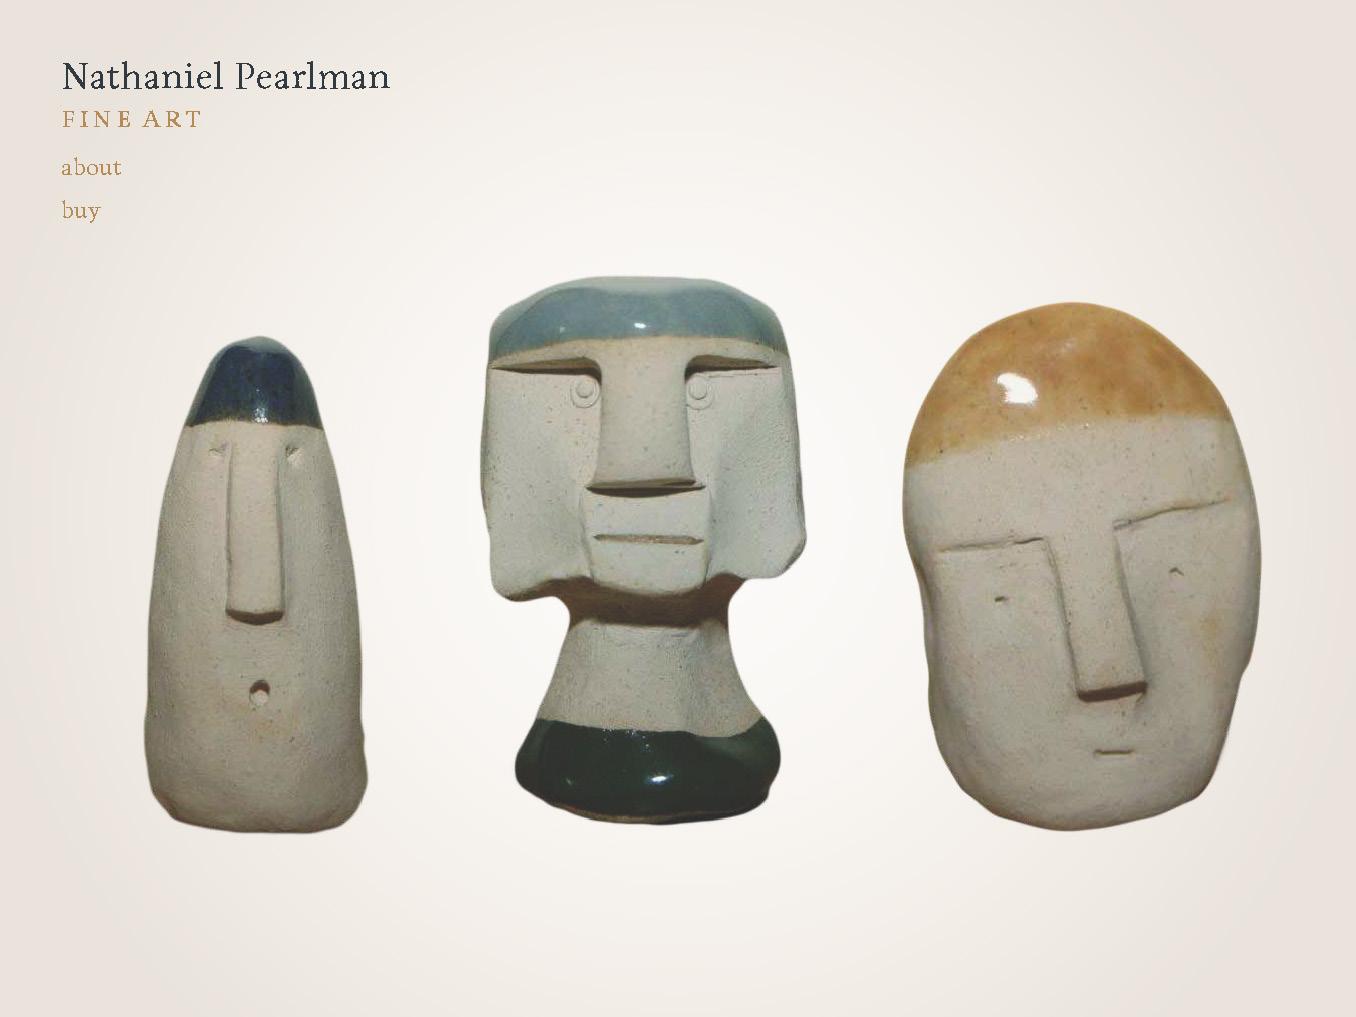 Nathaniel-web-sites-4-29-12-sculptures_Page_1.jpg